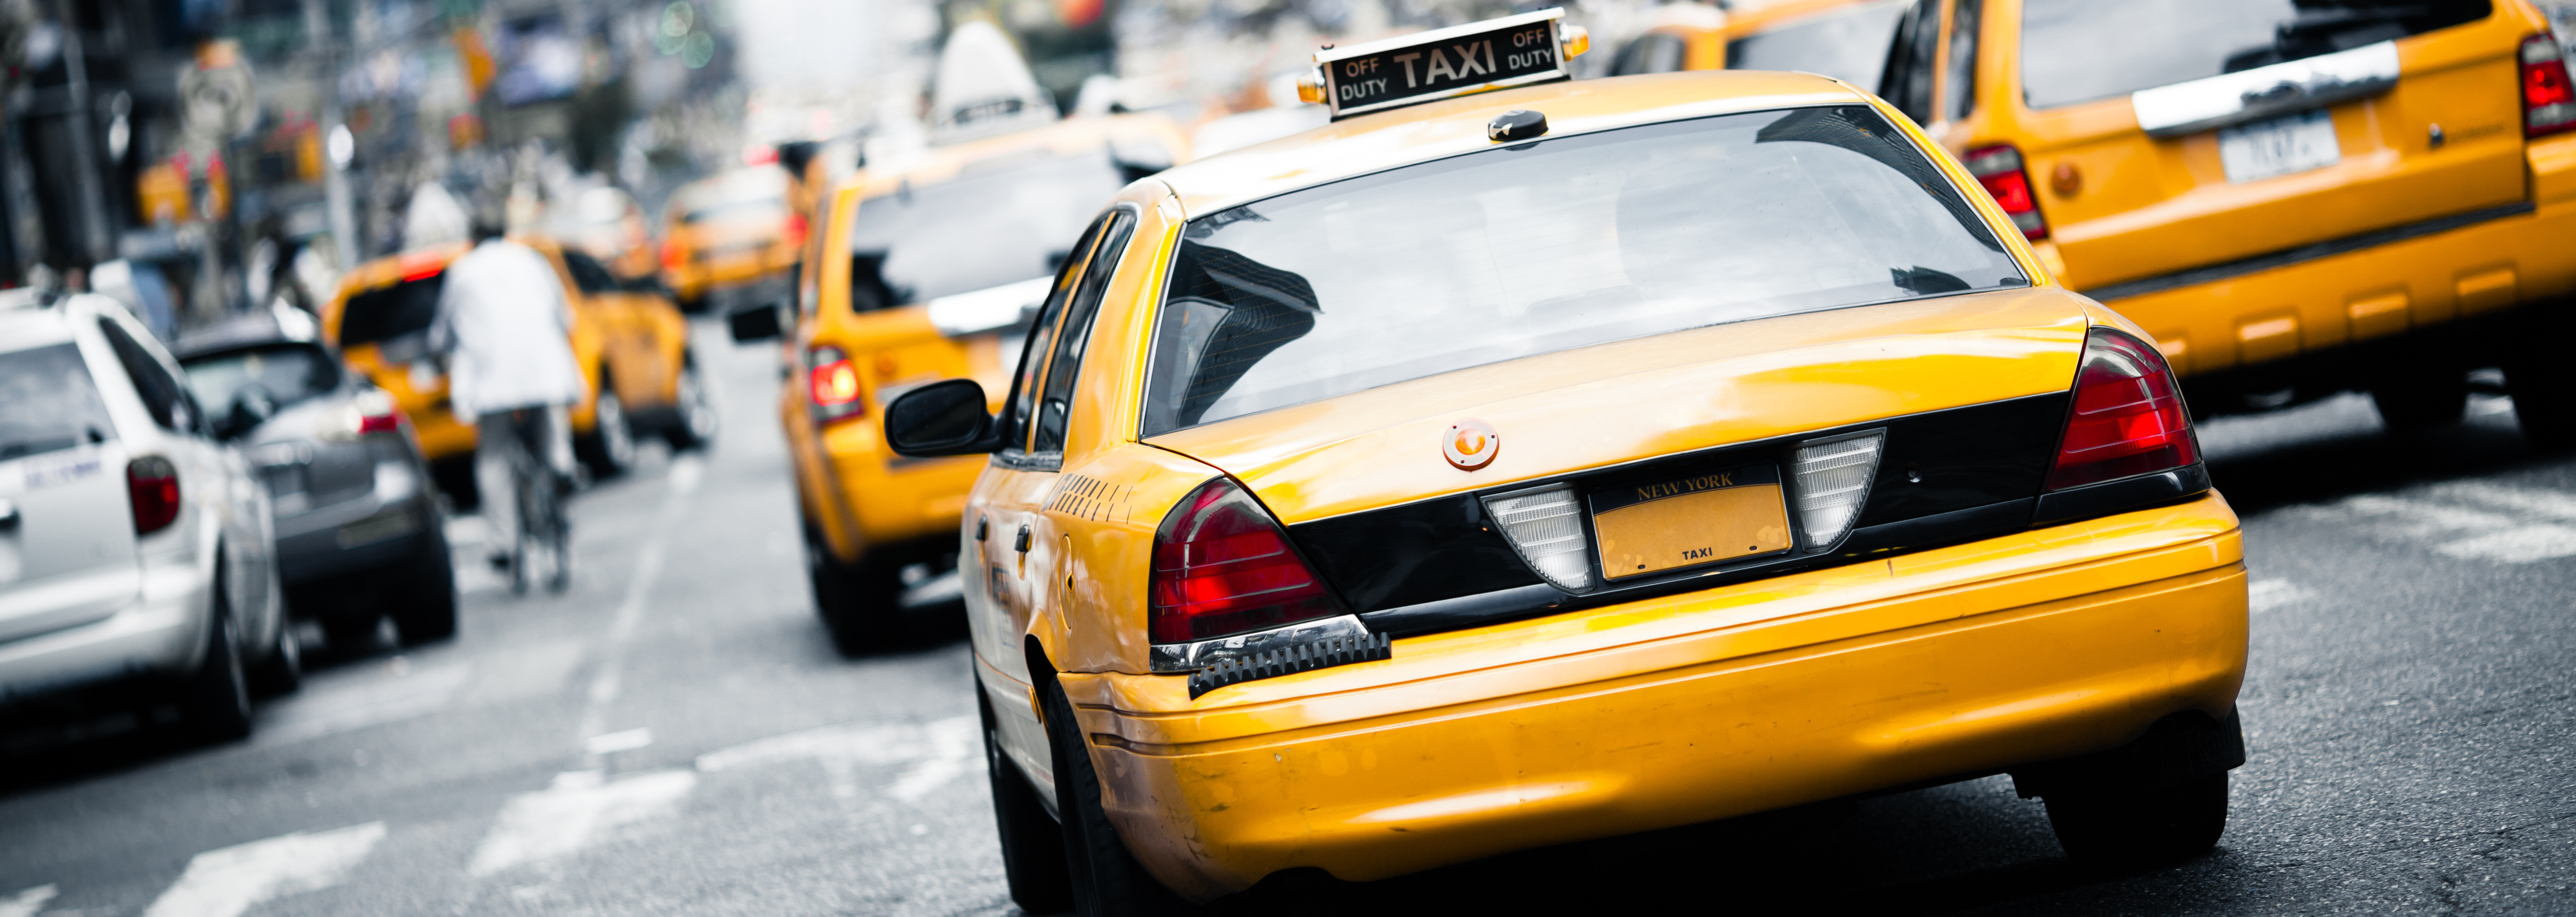 taxi on city street